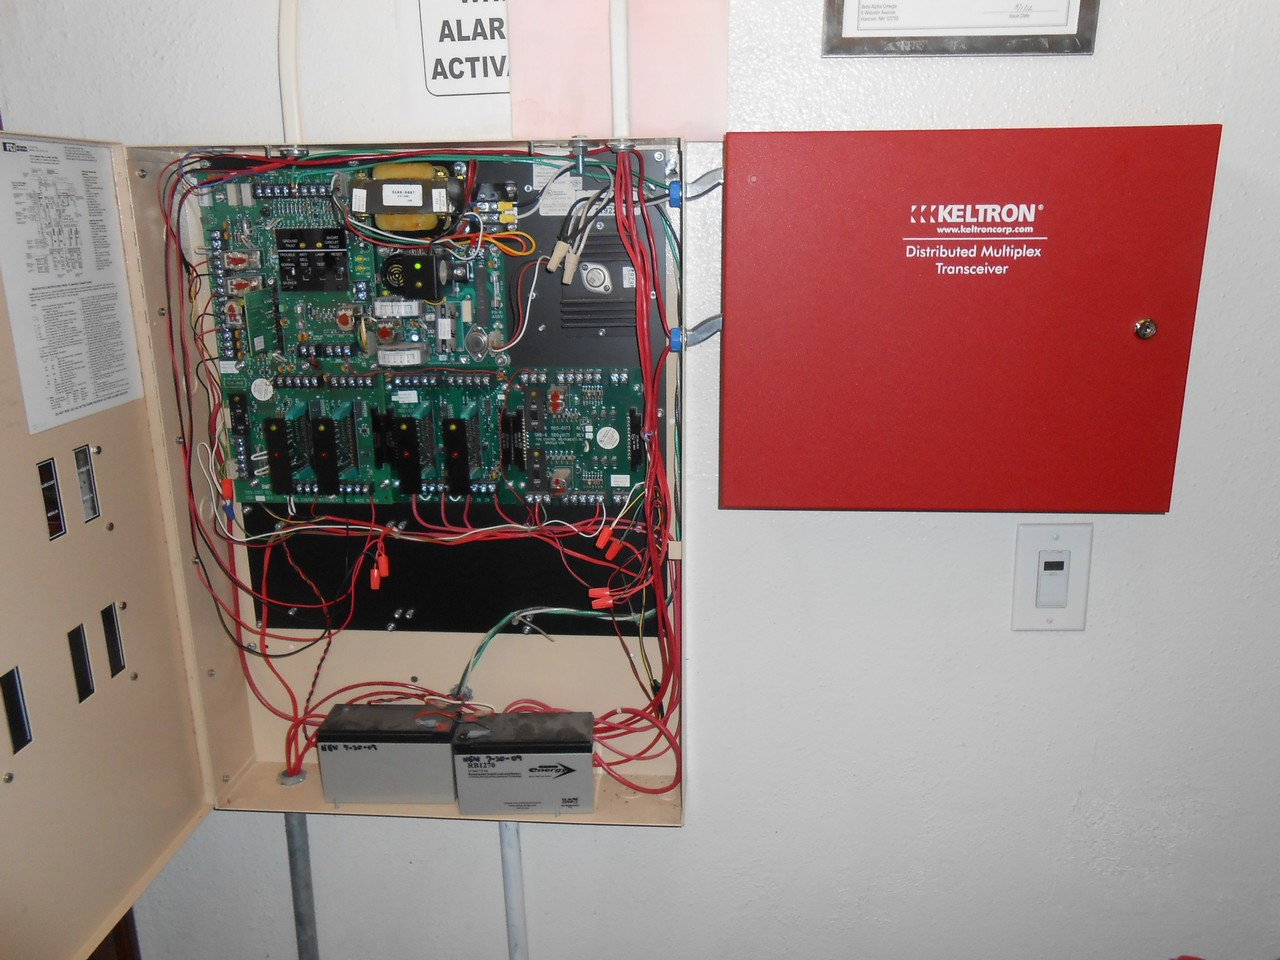 Dartmouth College Campus Fire Alarm - Hanover, NH